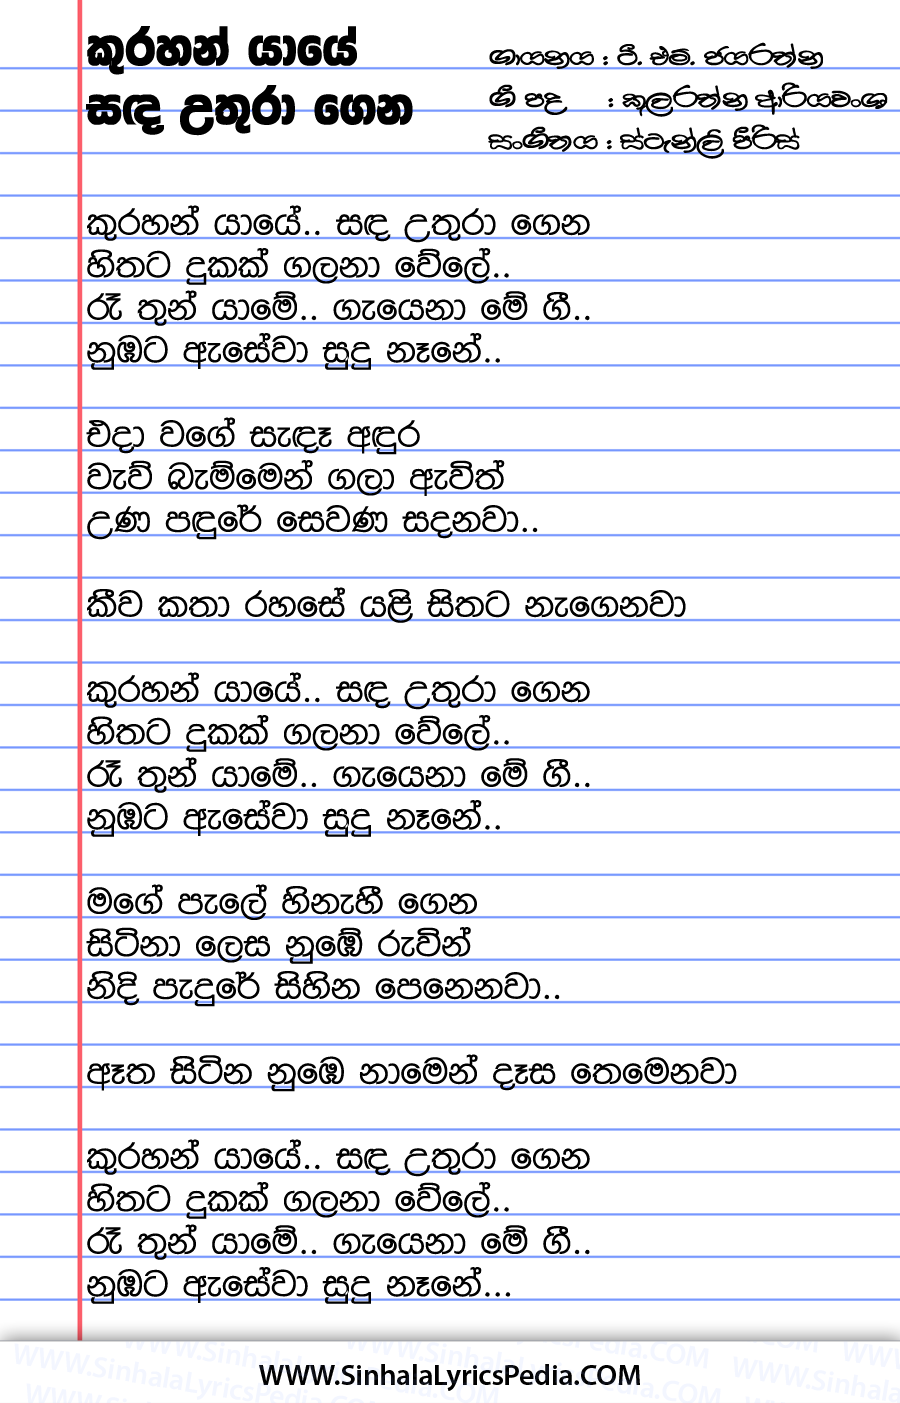 Kurahan Yaye Sanda Uduragena Song Lyrics